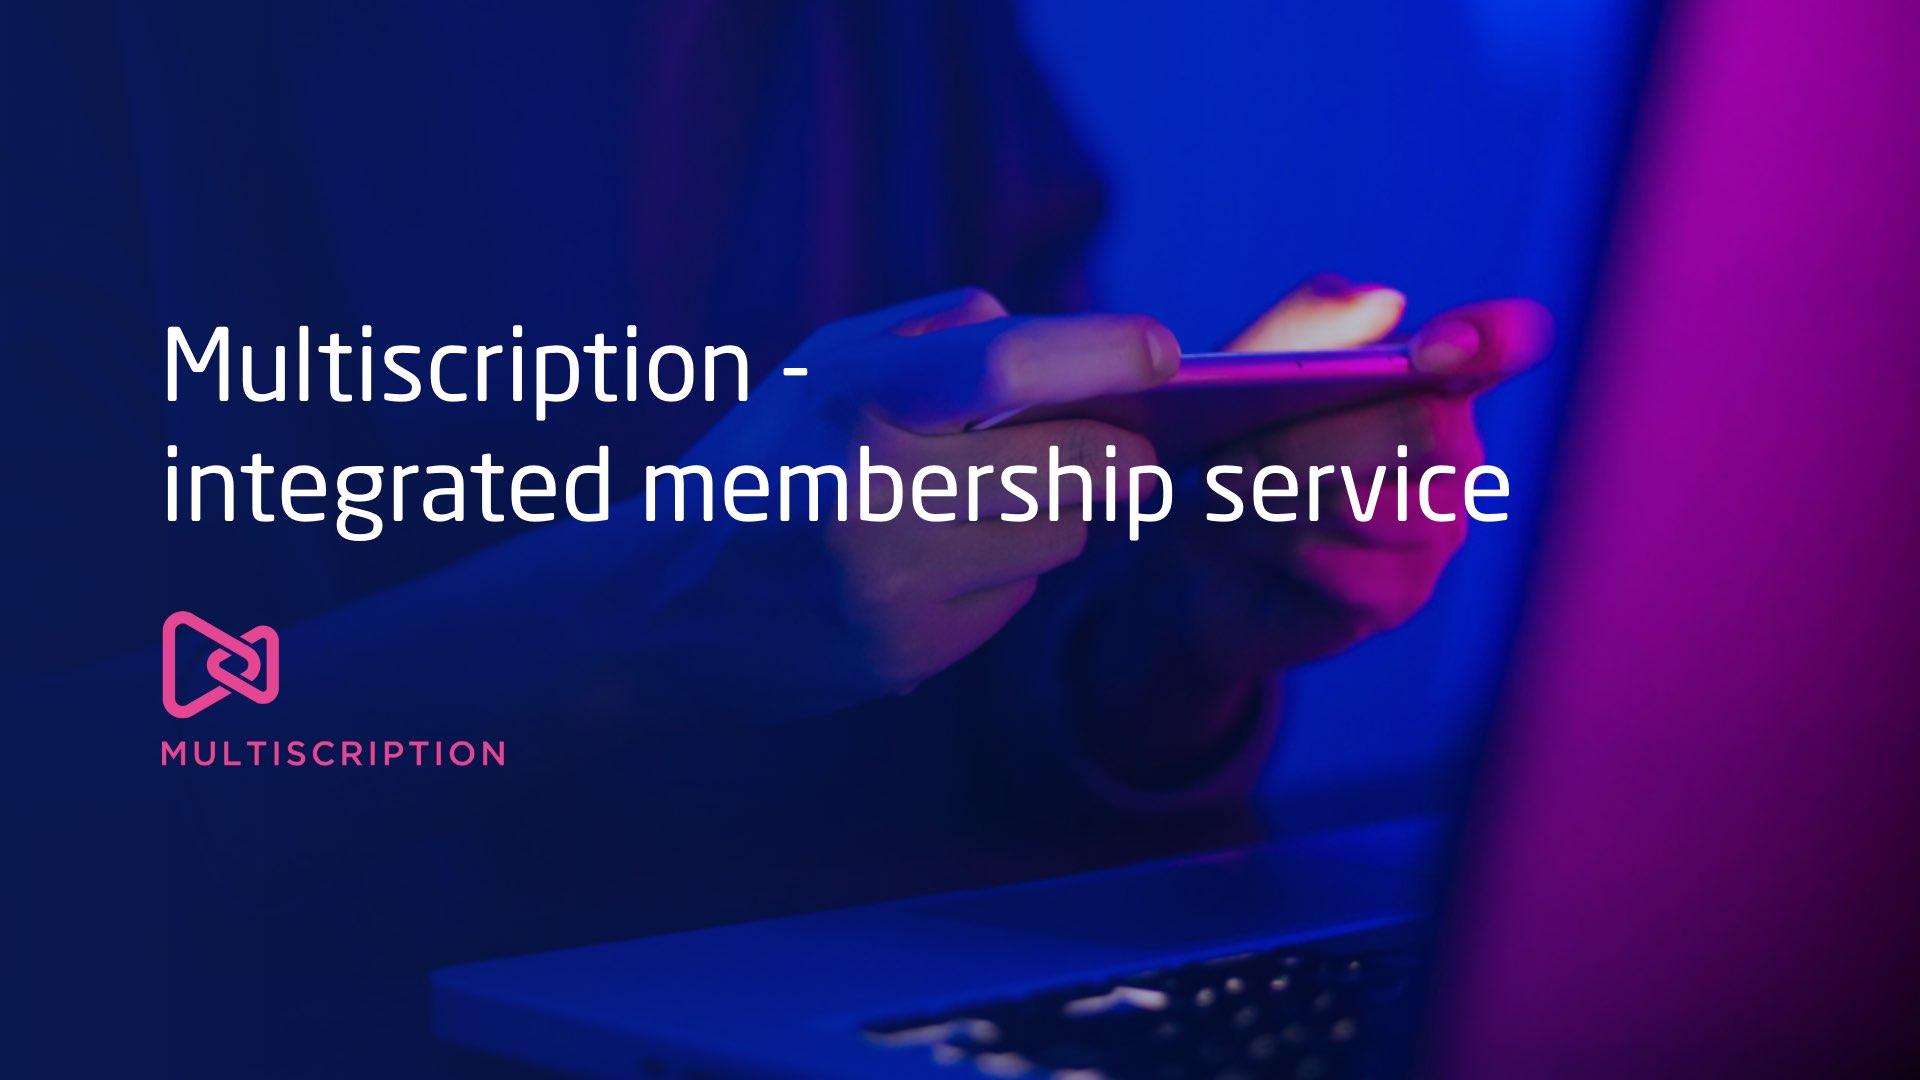 Multiscription - integrated membership service